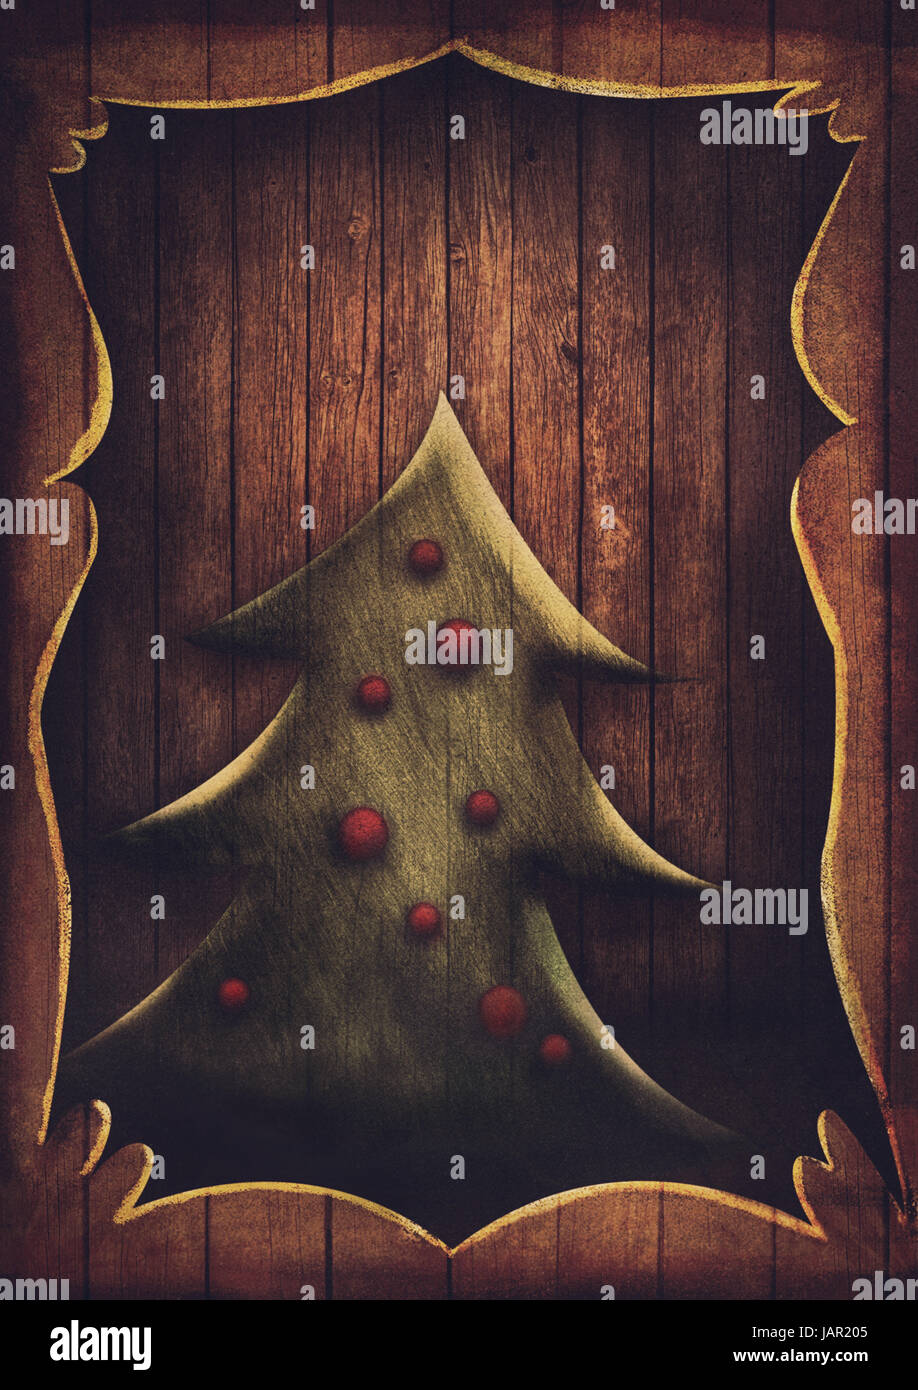 Christmas Card Vintage Christmas Tree In Wooden Frame Cartoon Stock Photo Alamy Cartoon christmas tree with city. alamy